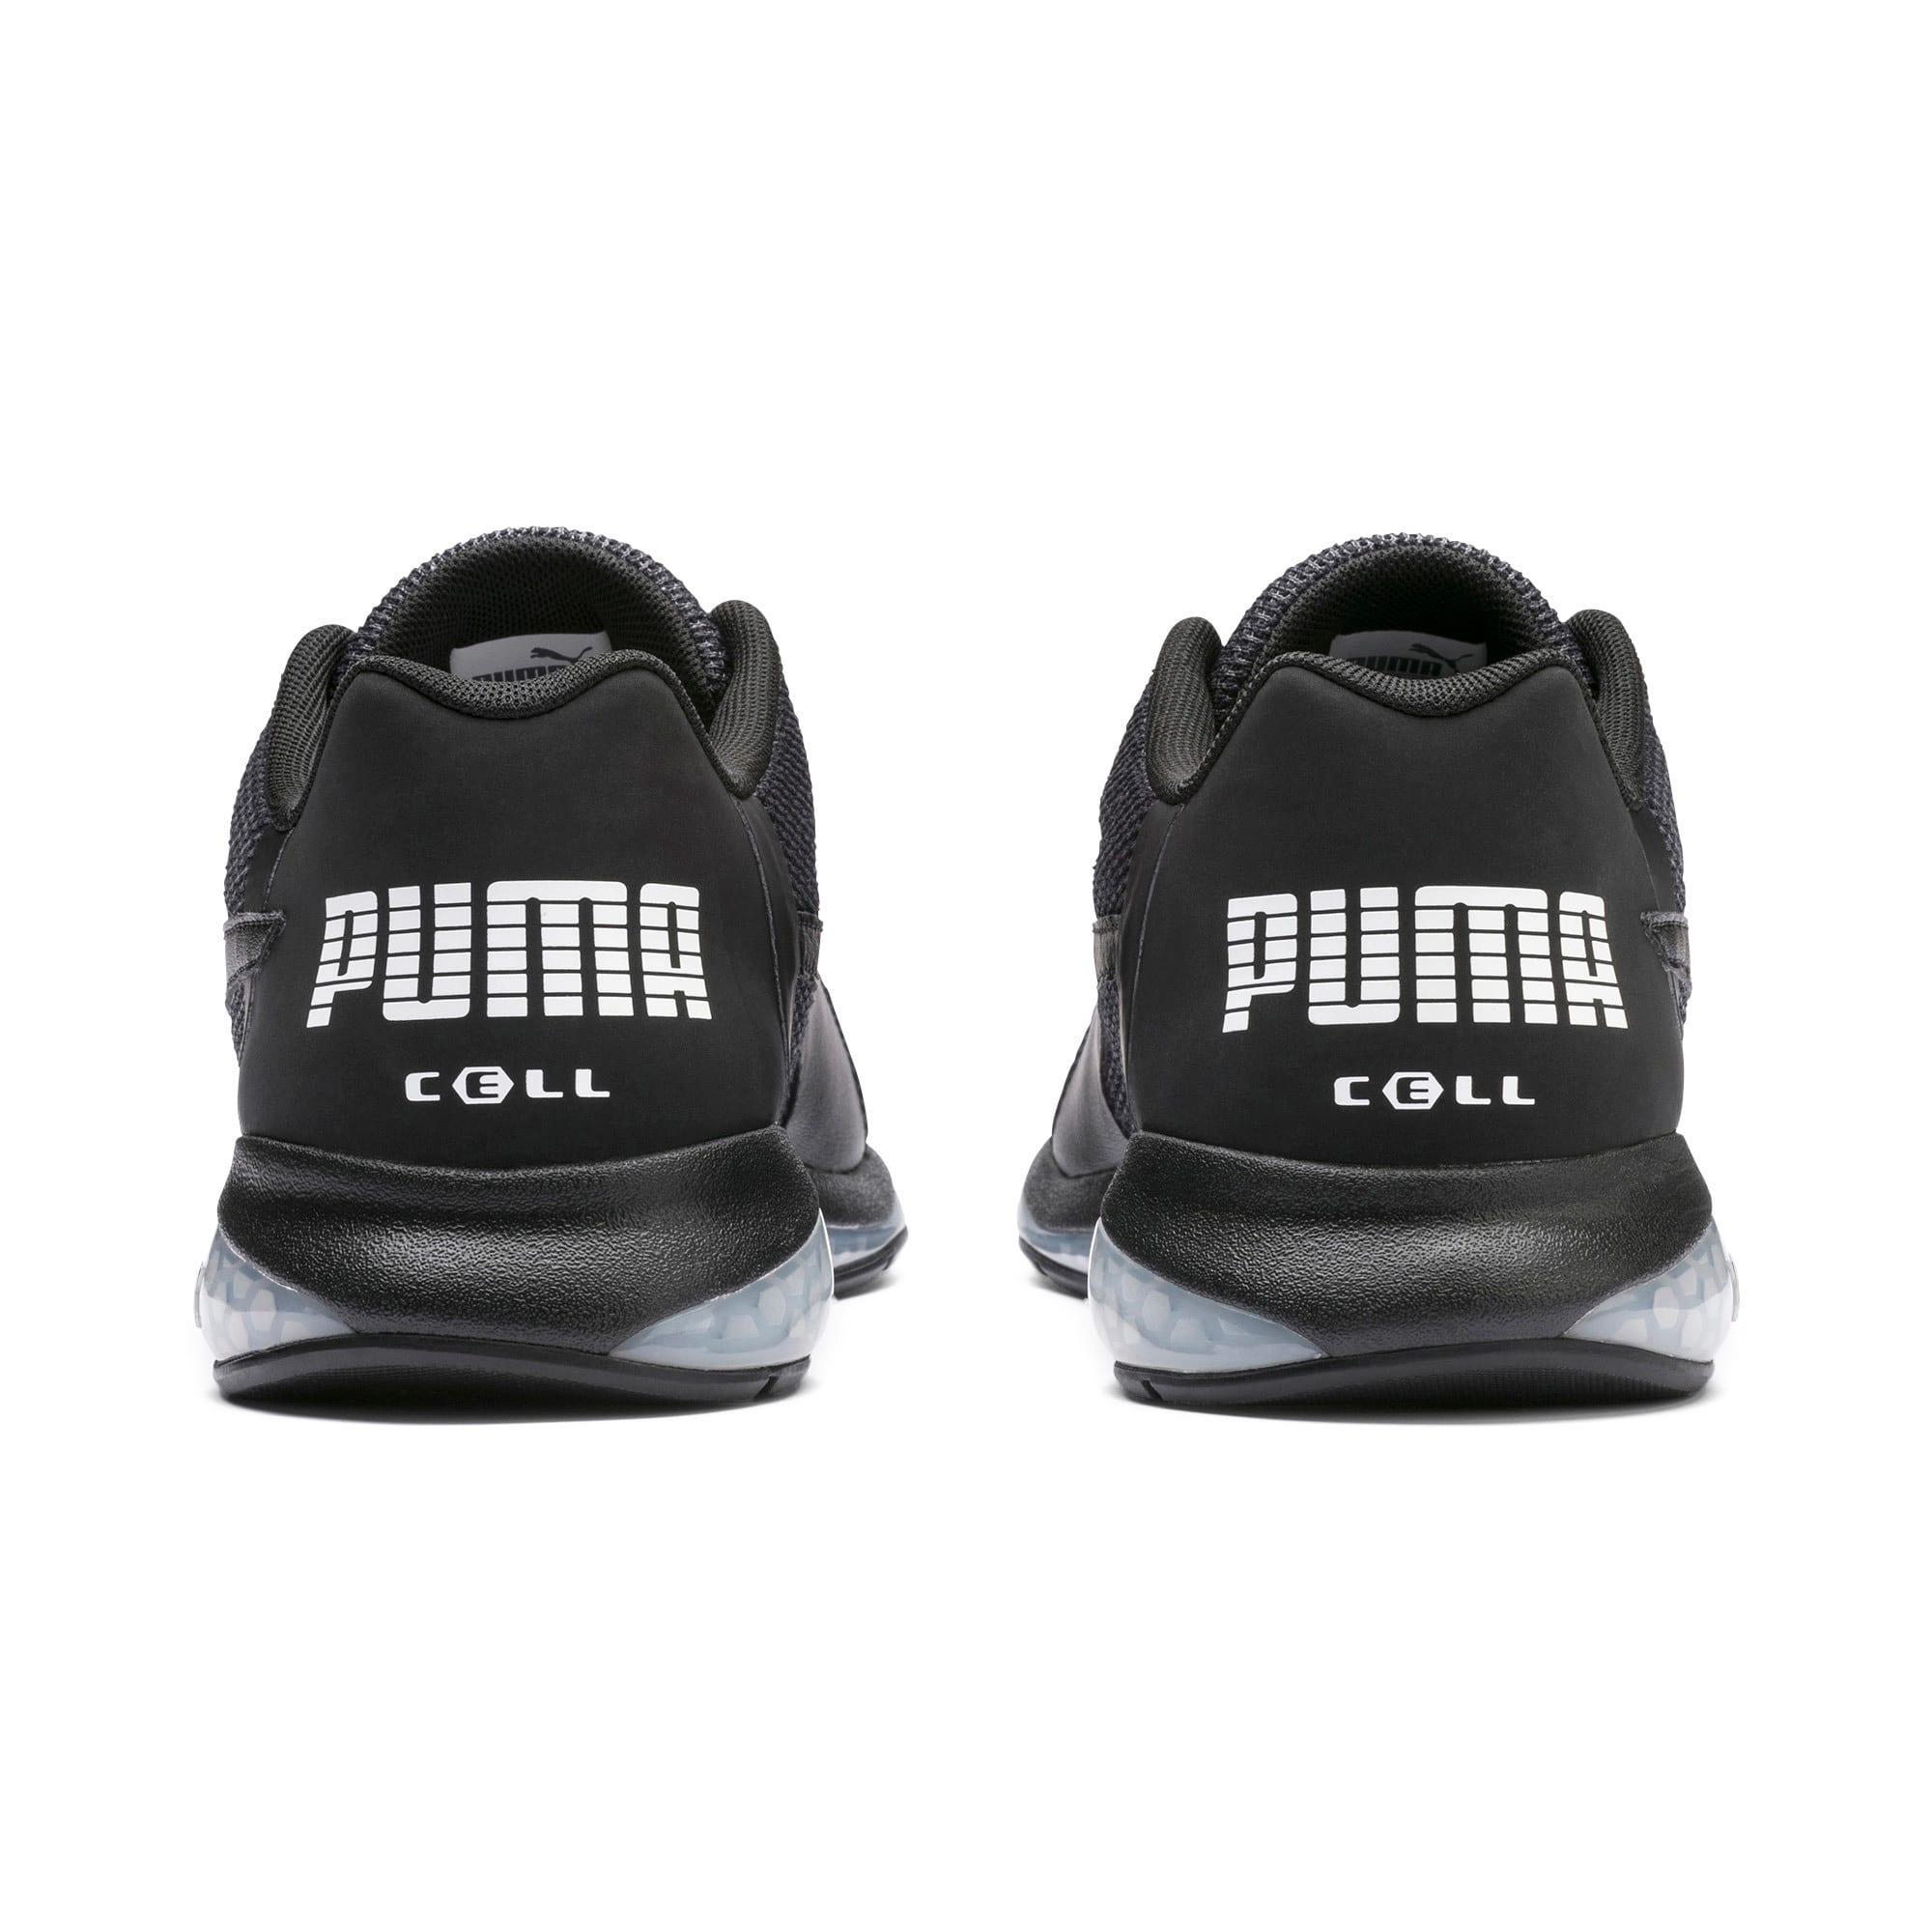 Thumbnail 3 of Cell Ultimate Point Knitted Herren Laufschuhe, Puma Black-Puma White, medium